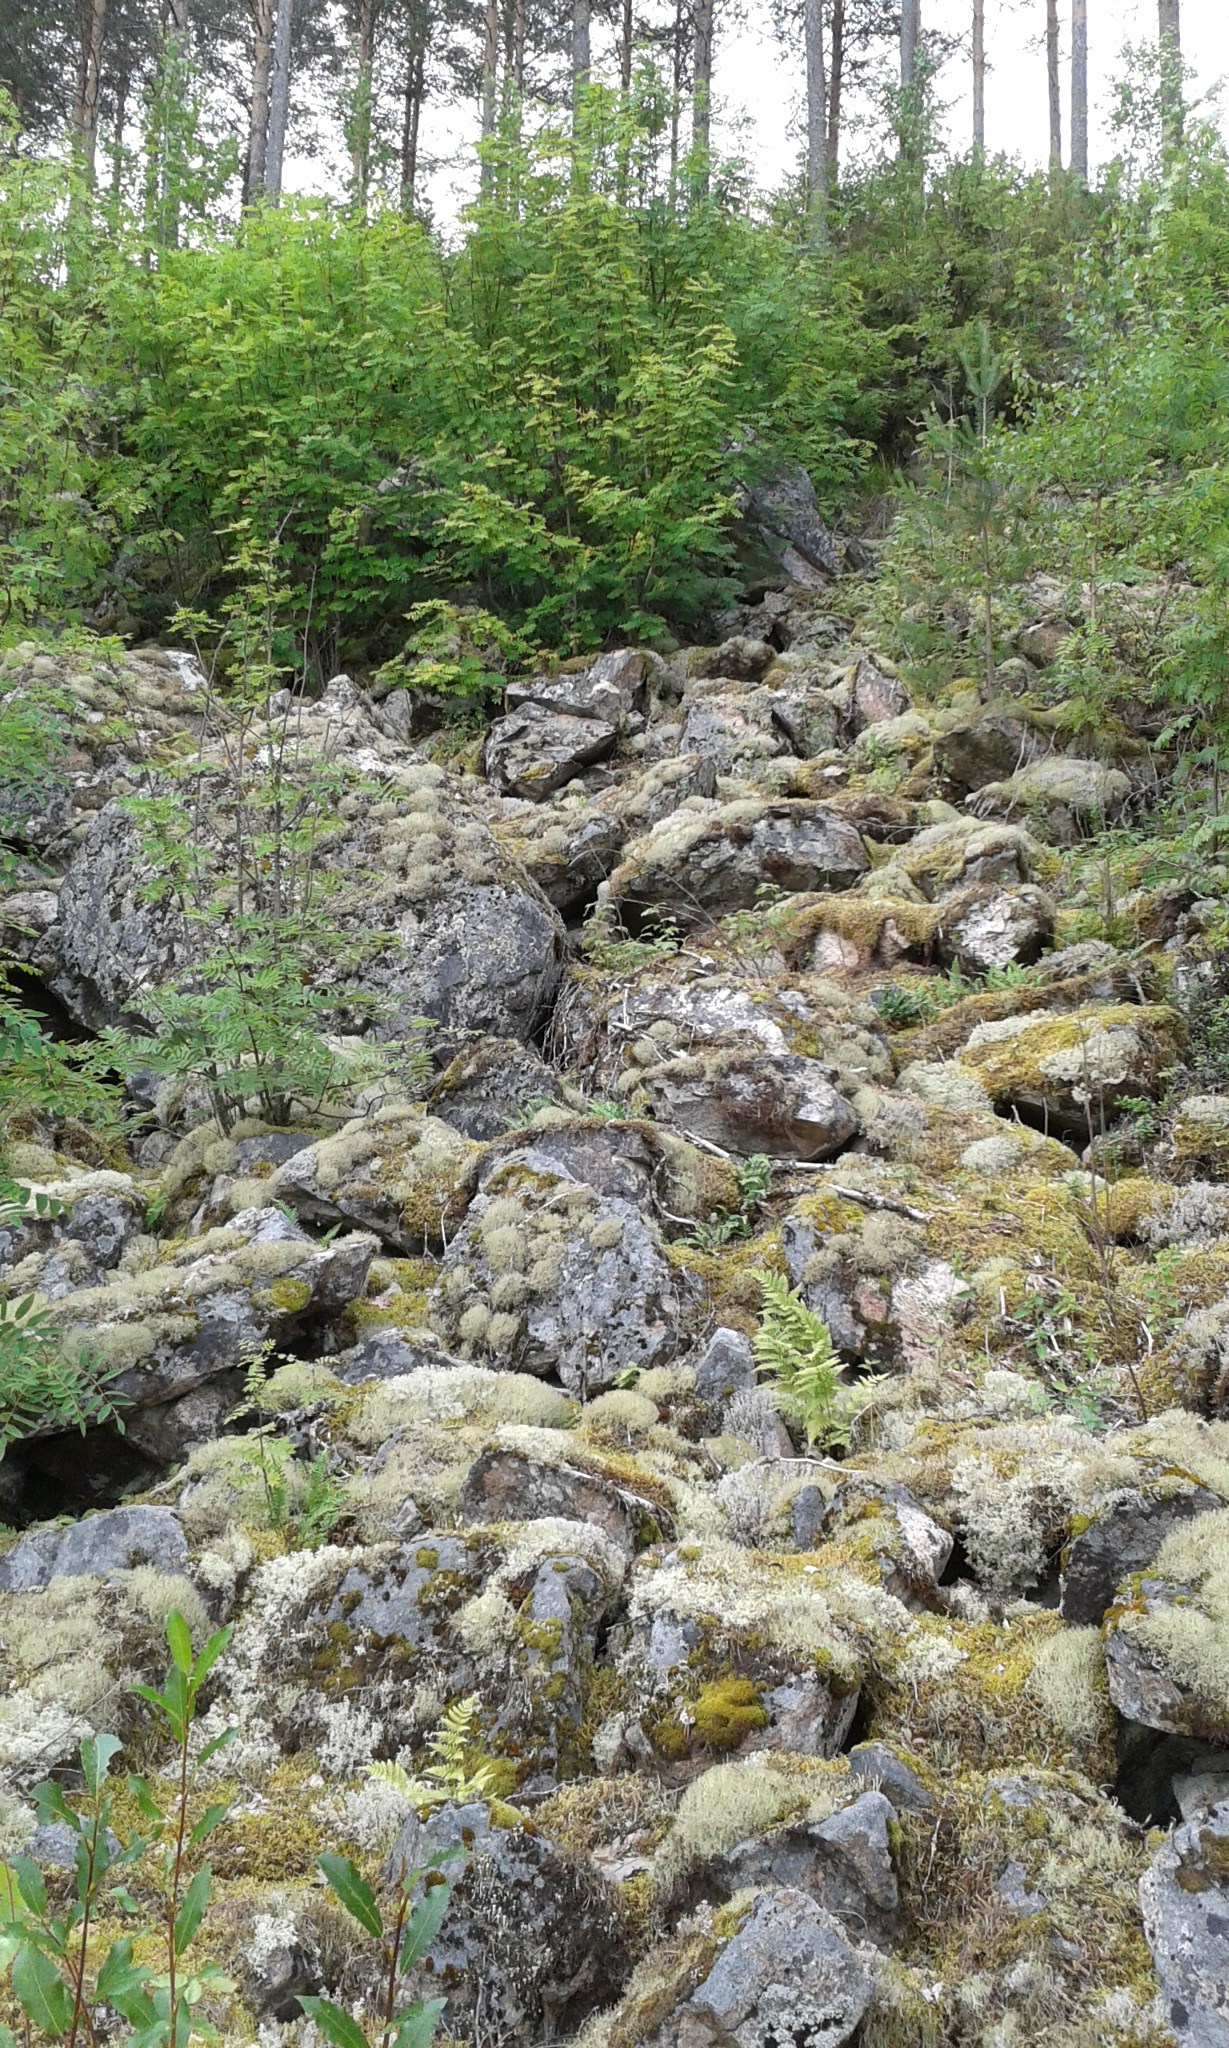 sammaleiset kivet by Pirkko Liisa Nikko